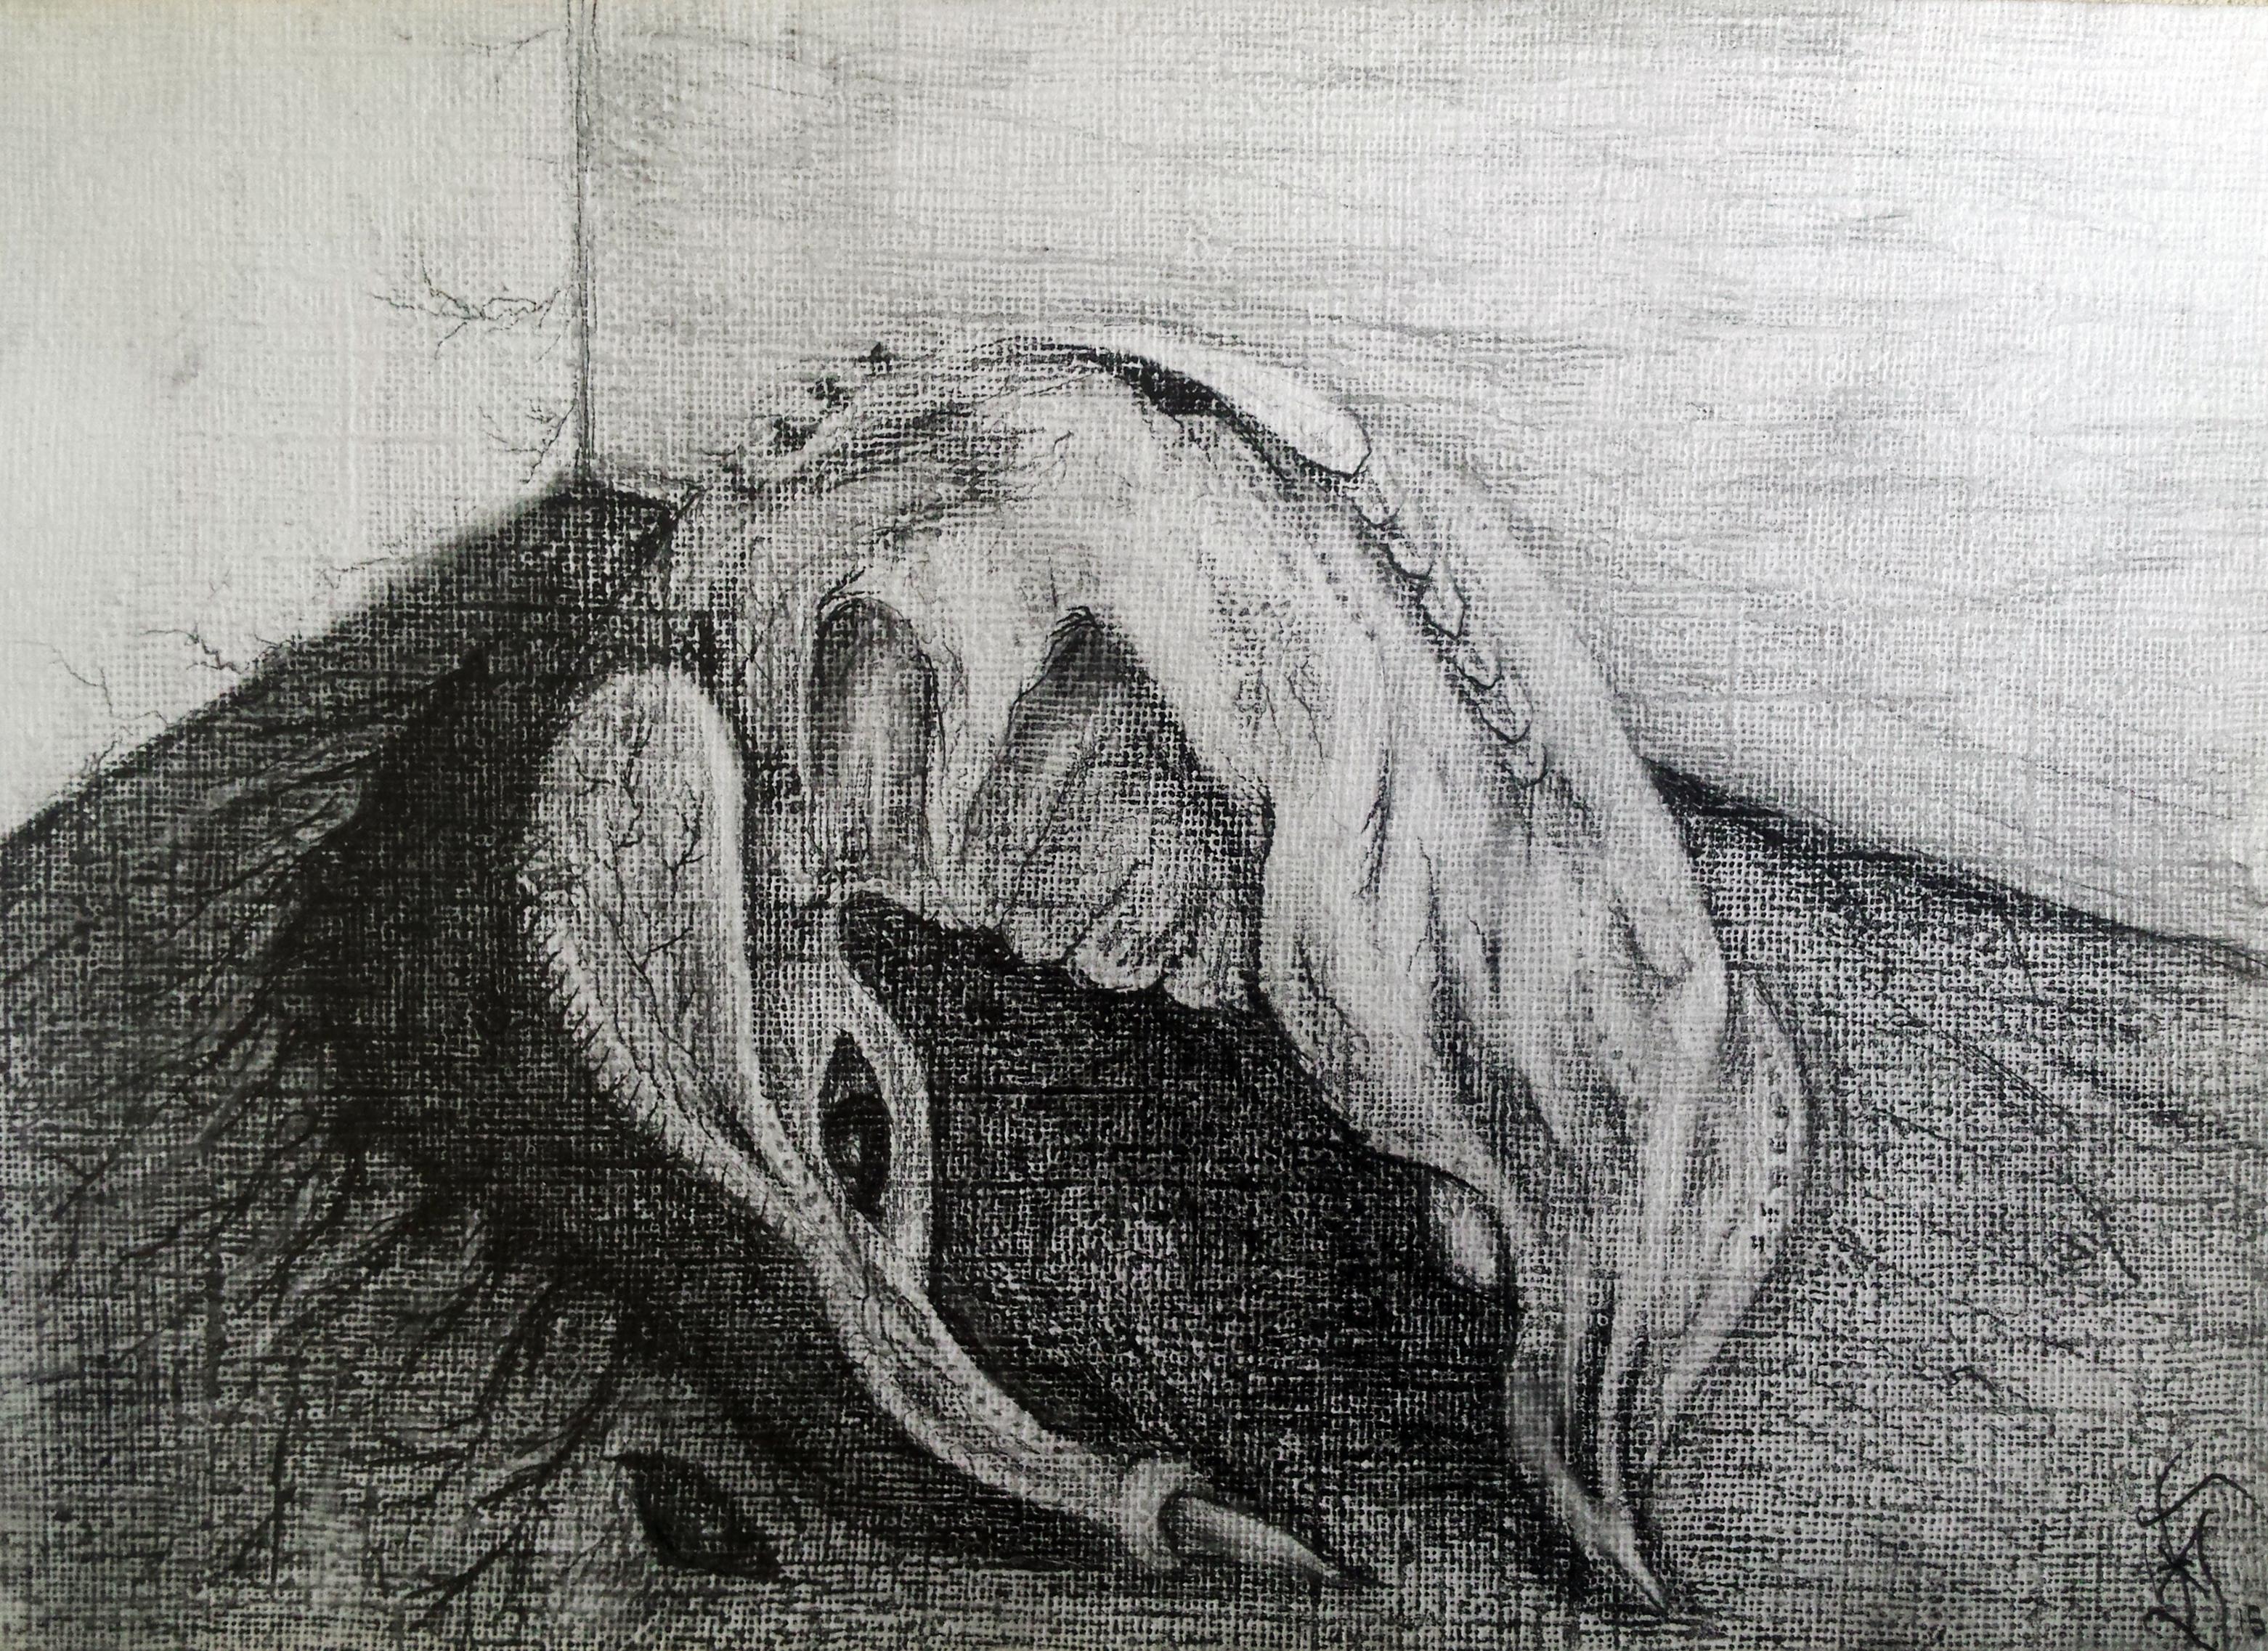 sketch of a hybrid in my dream